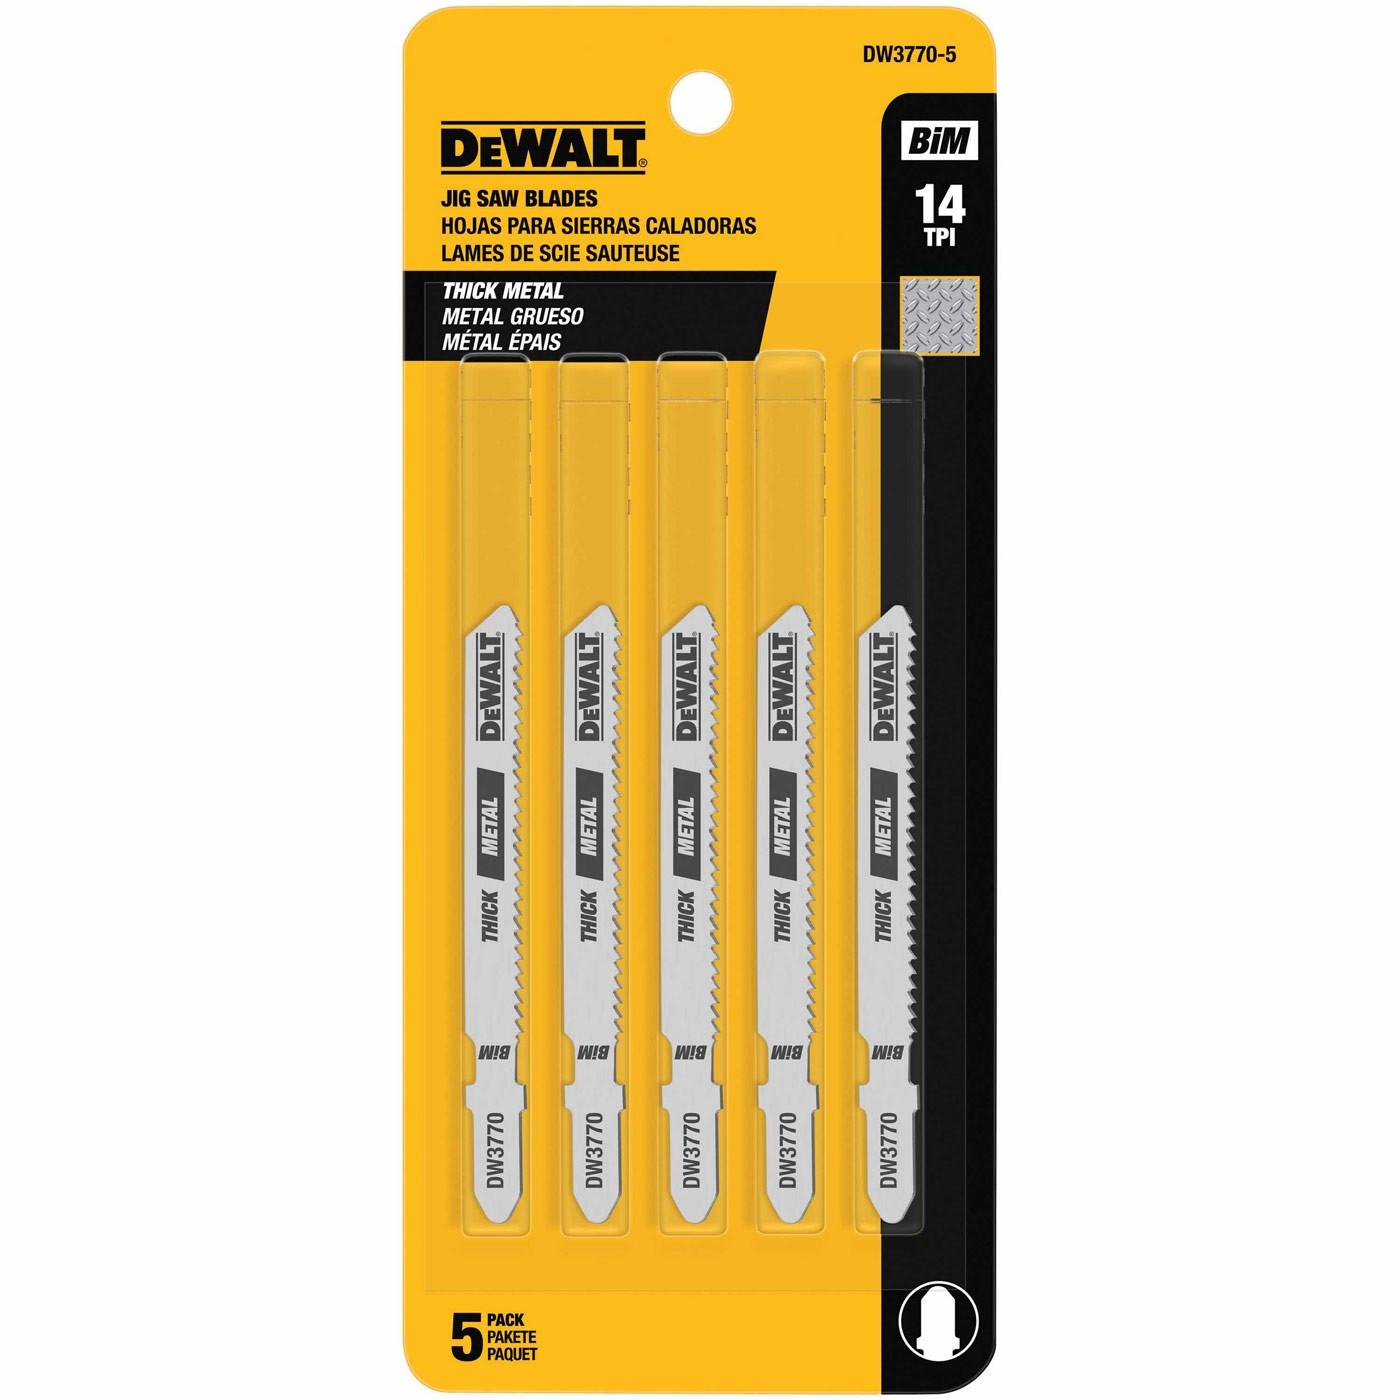 Dewalt dw3770 5 3 14 tpi t shank cobalt steel jig saw blade 5 pack greentooth Gallery